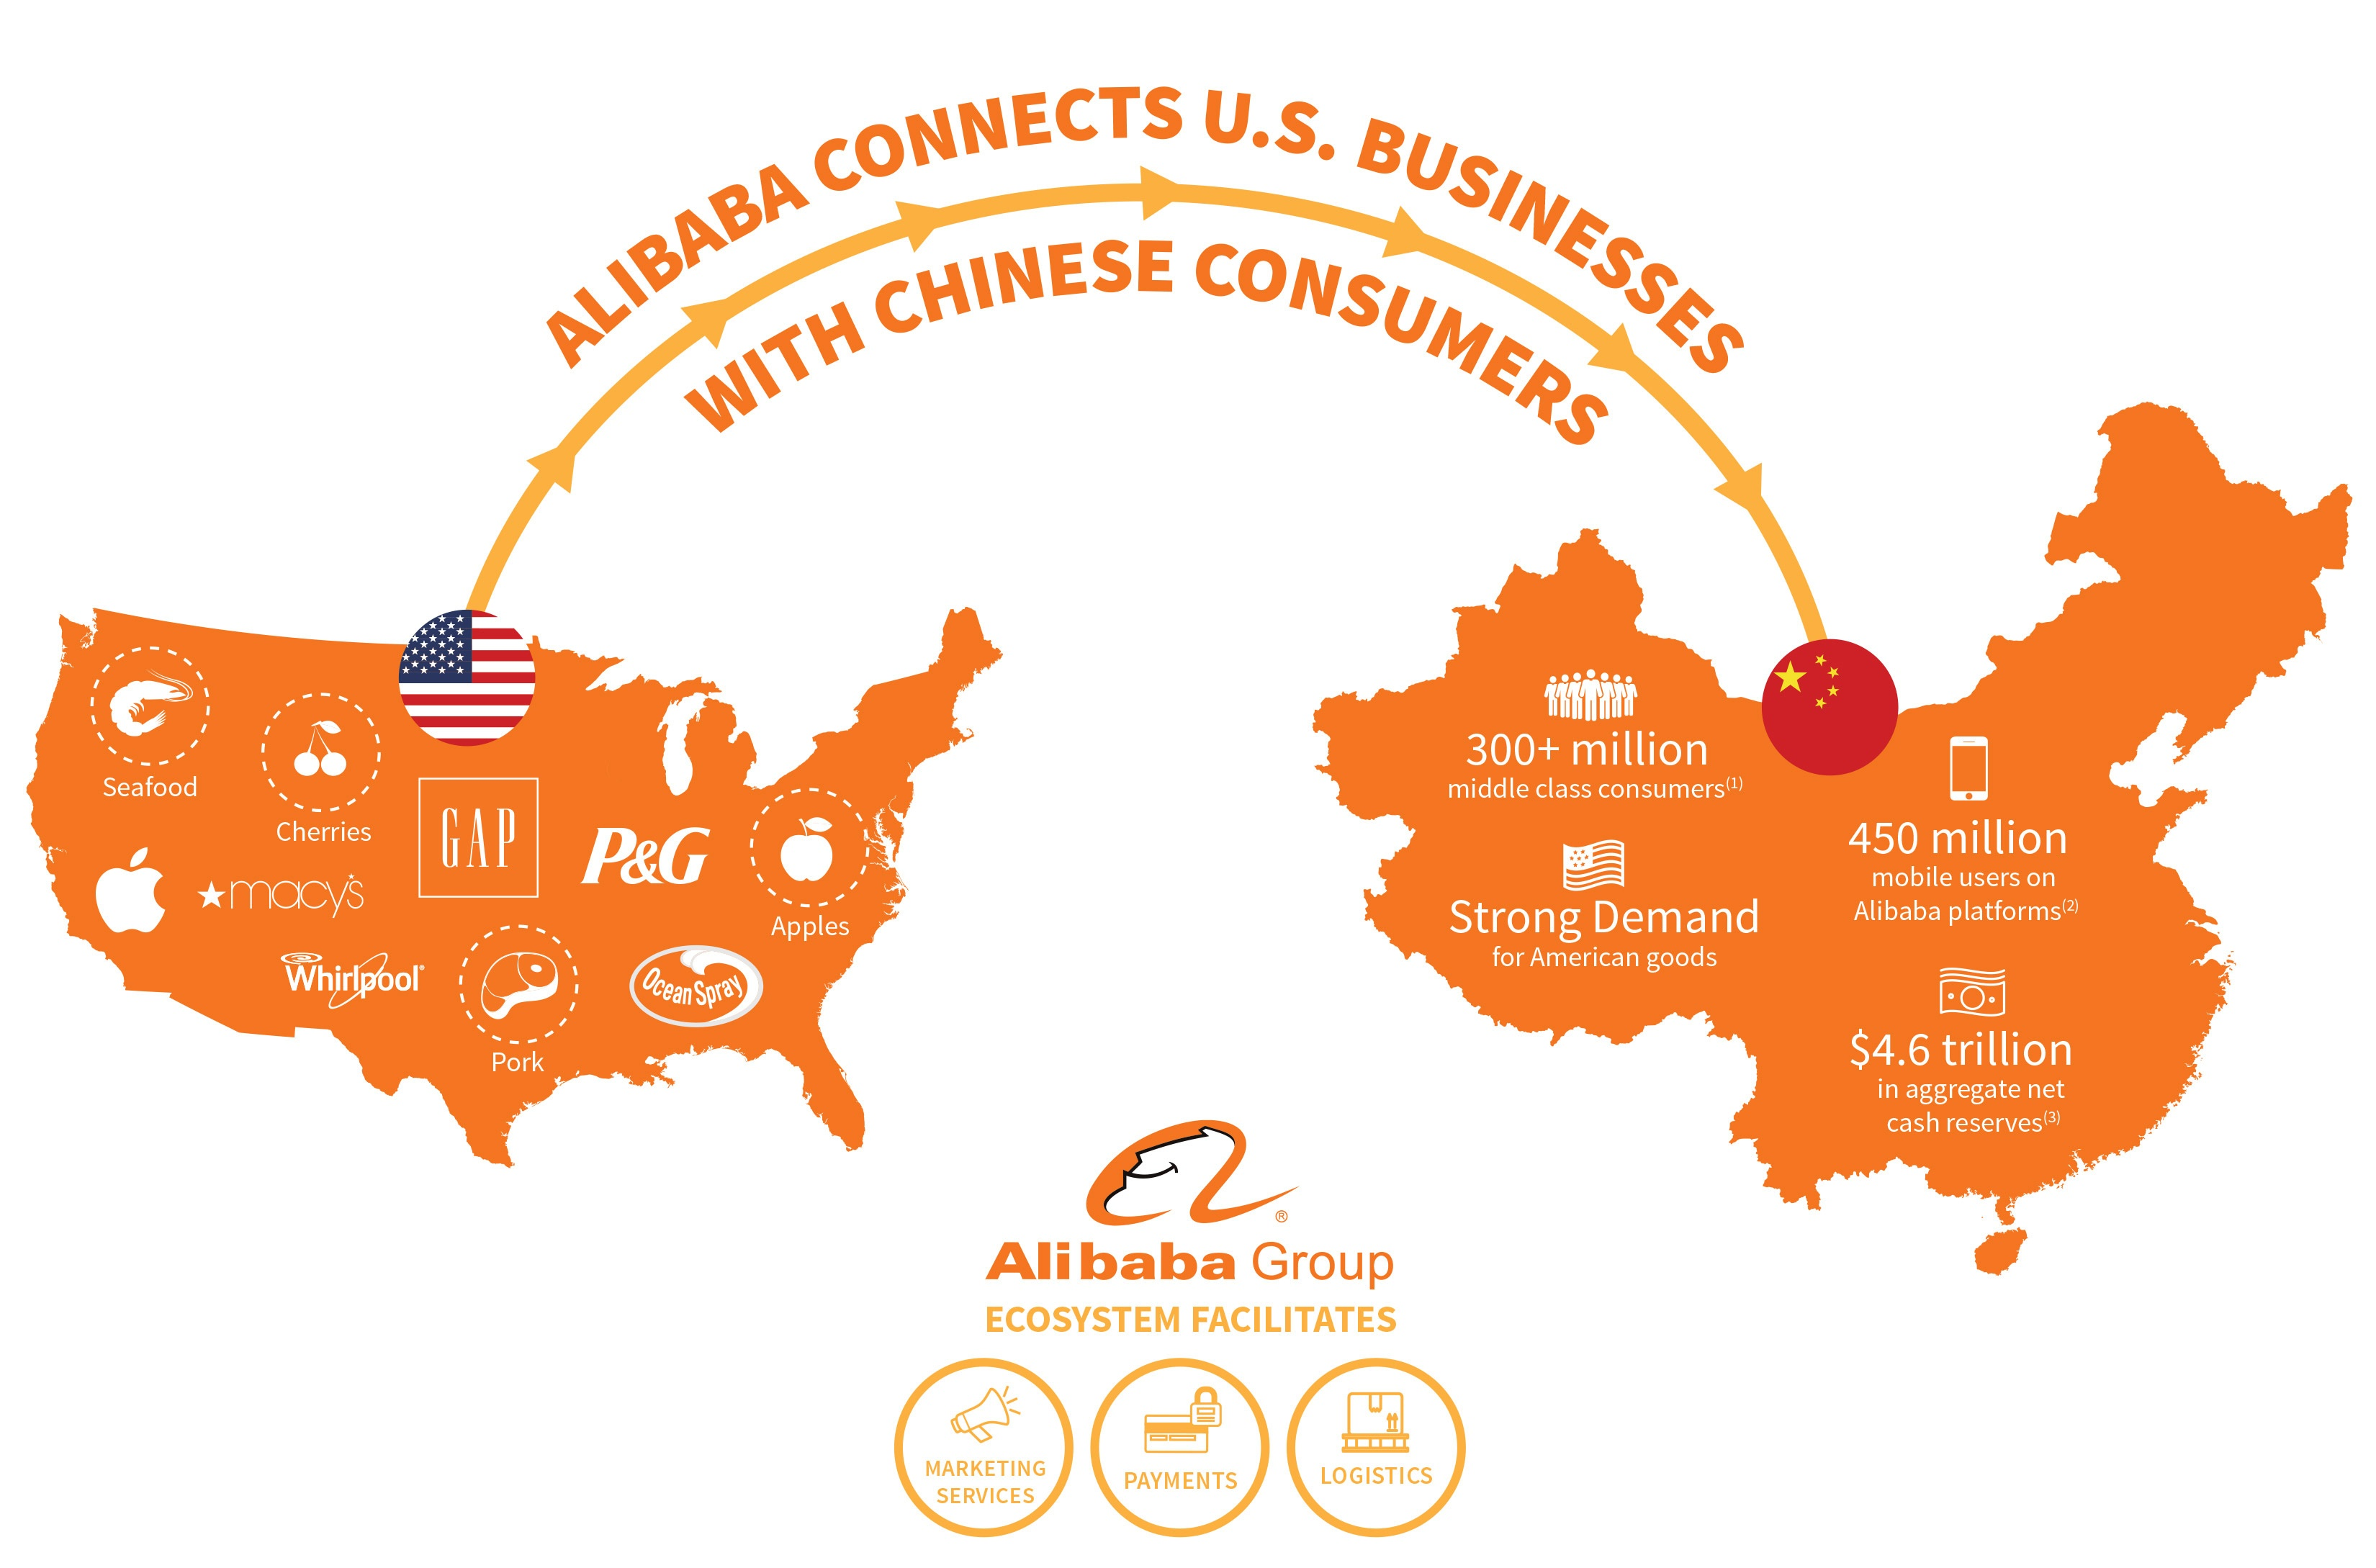 Alibaba-US-Infographic-Final.jpg